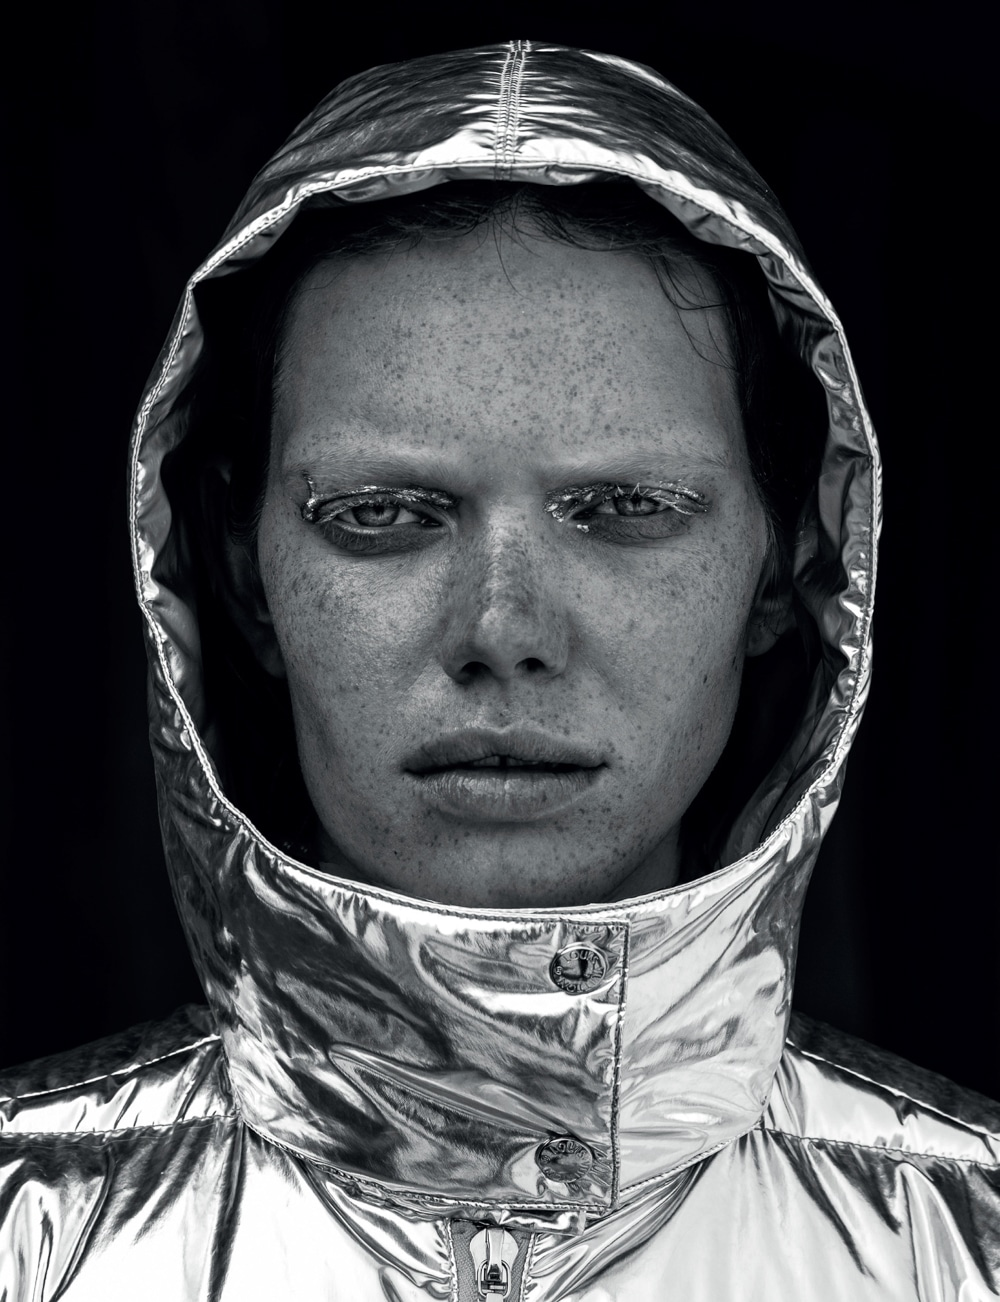 Vogue-Portugal-Nika-Rusakova-Filip-Koludrovic-11.jpg